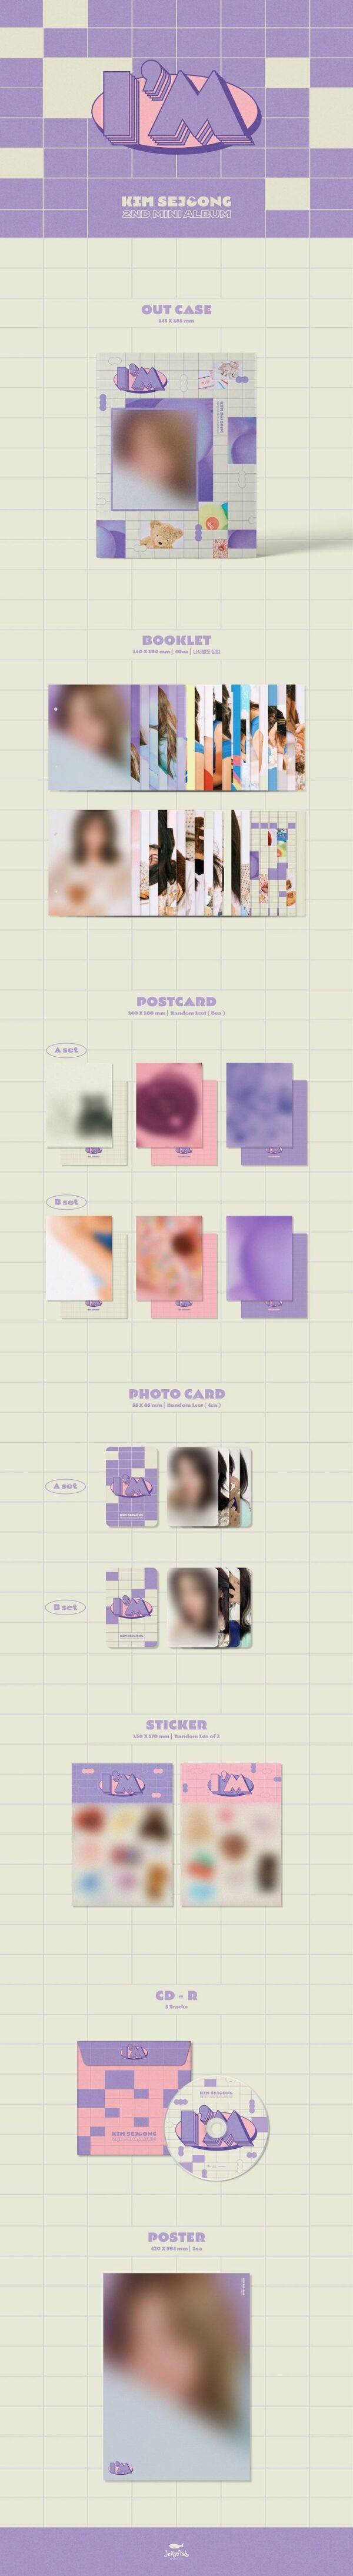 Kim Se Jeong 2nd Mini Im Poster